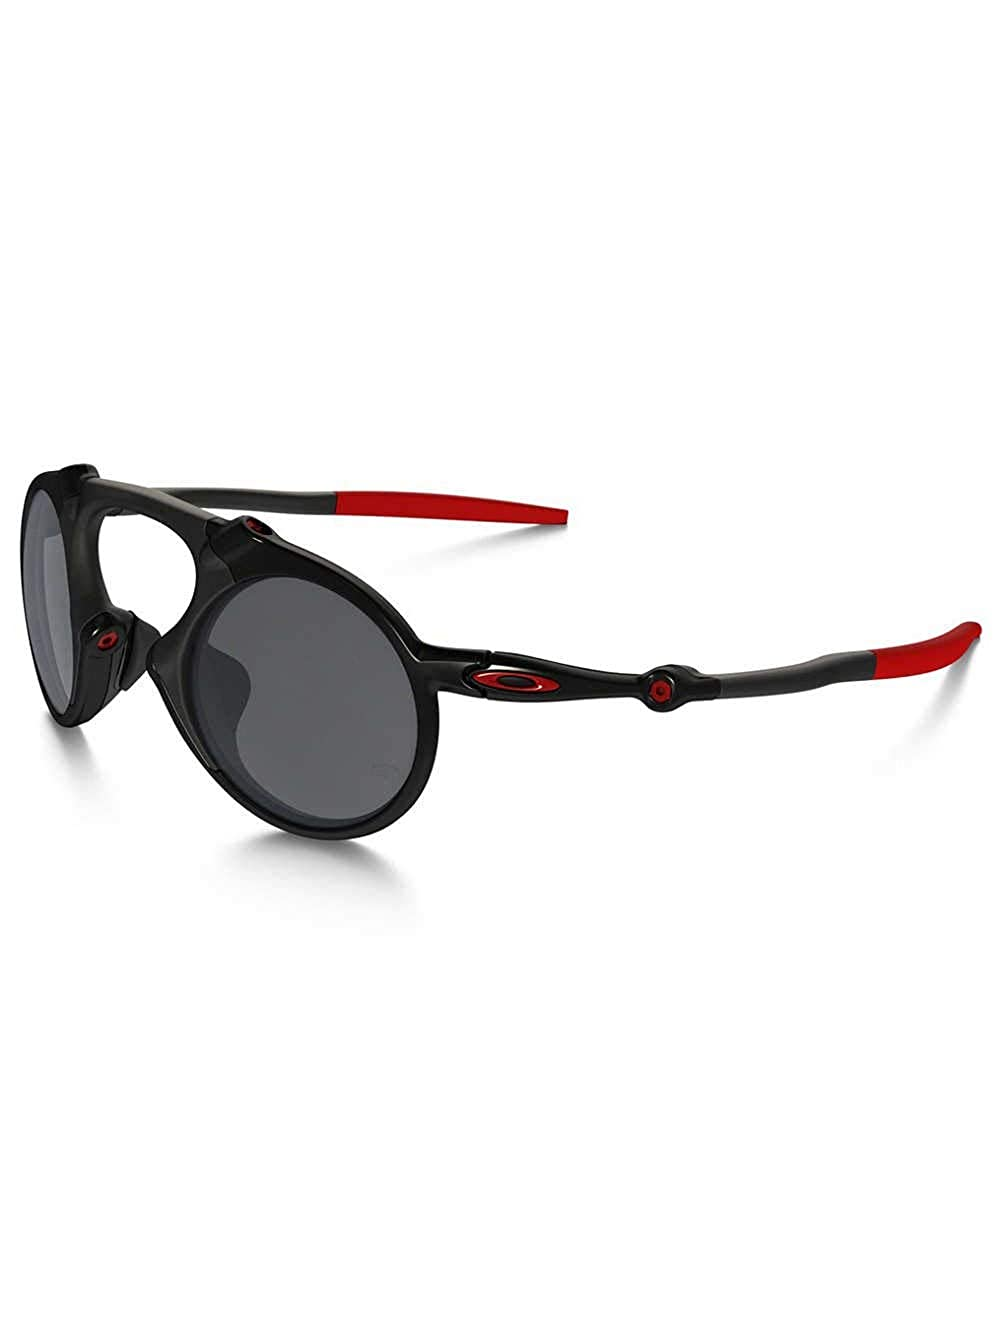 bc952b9e00 Oakley Men s Madman OO6019-06 Polarized Iridium Round Sunglasses ...